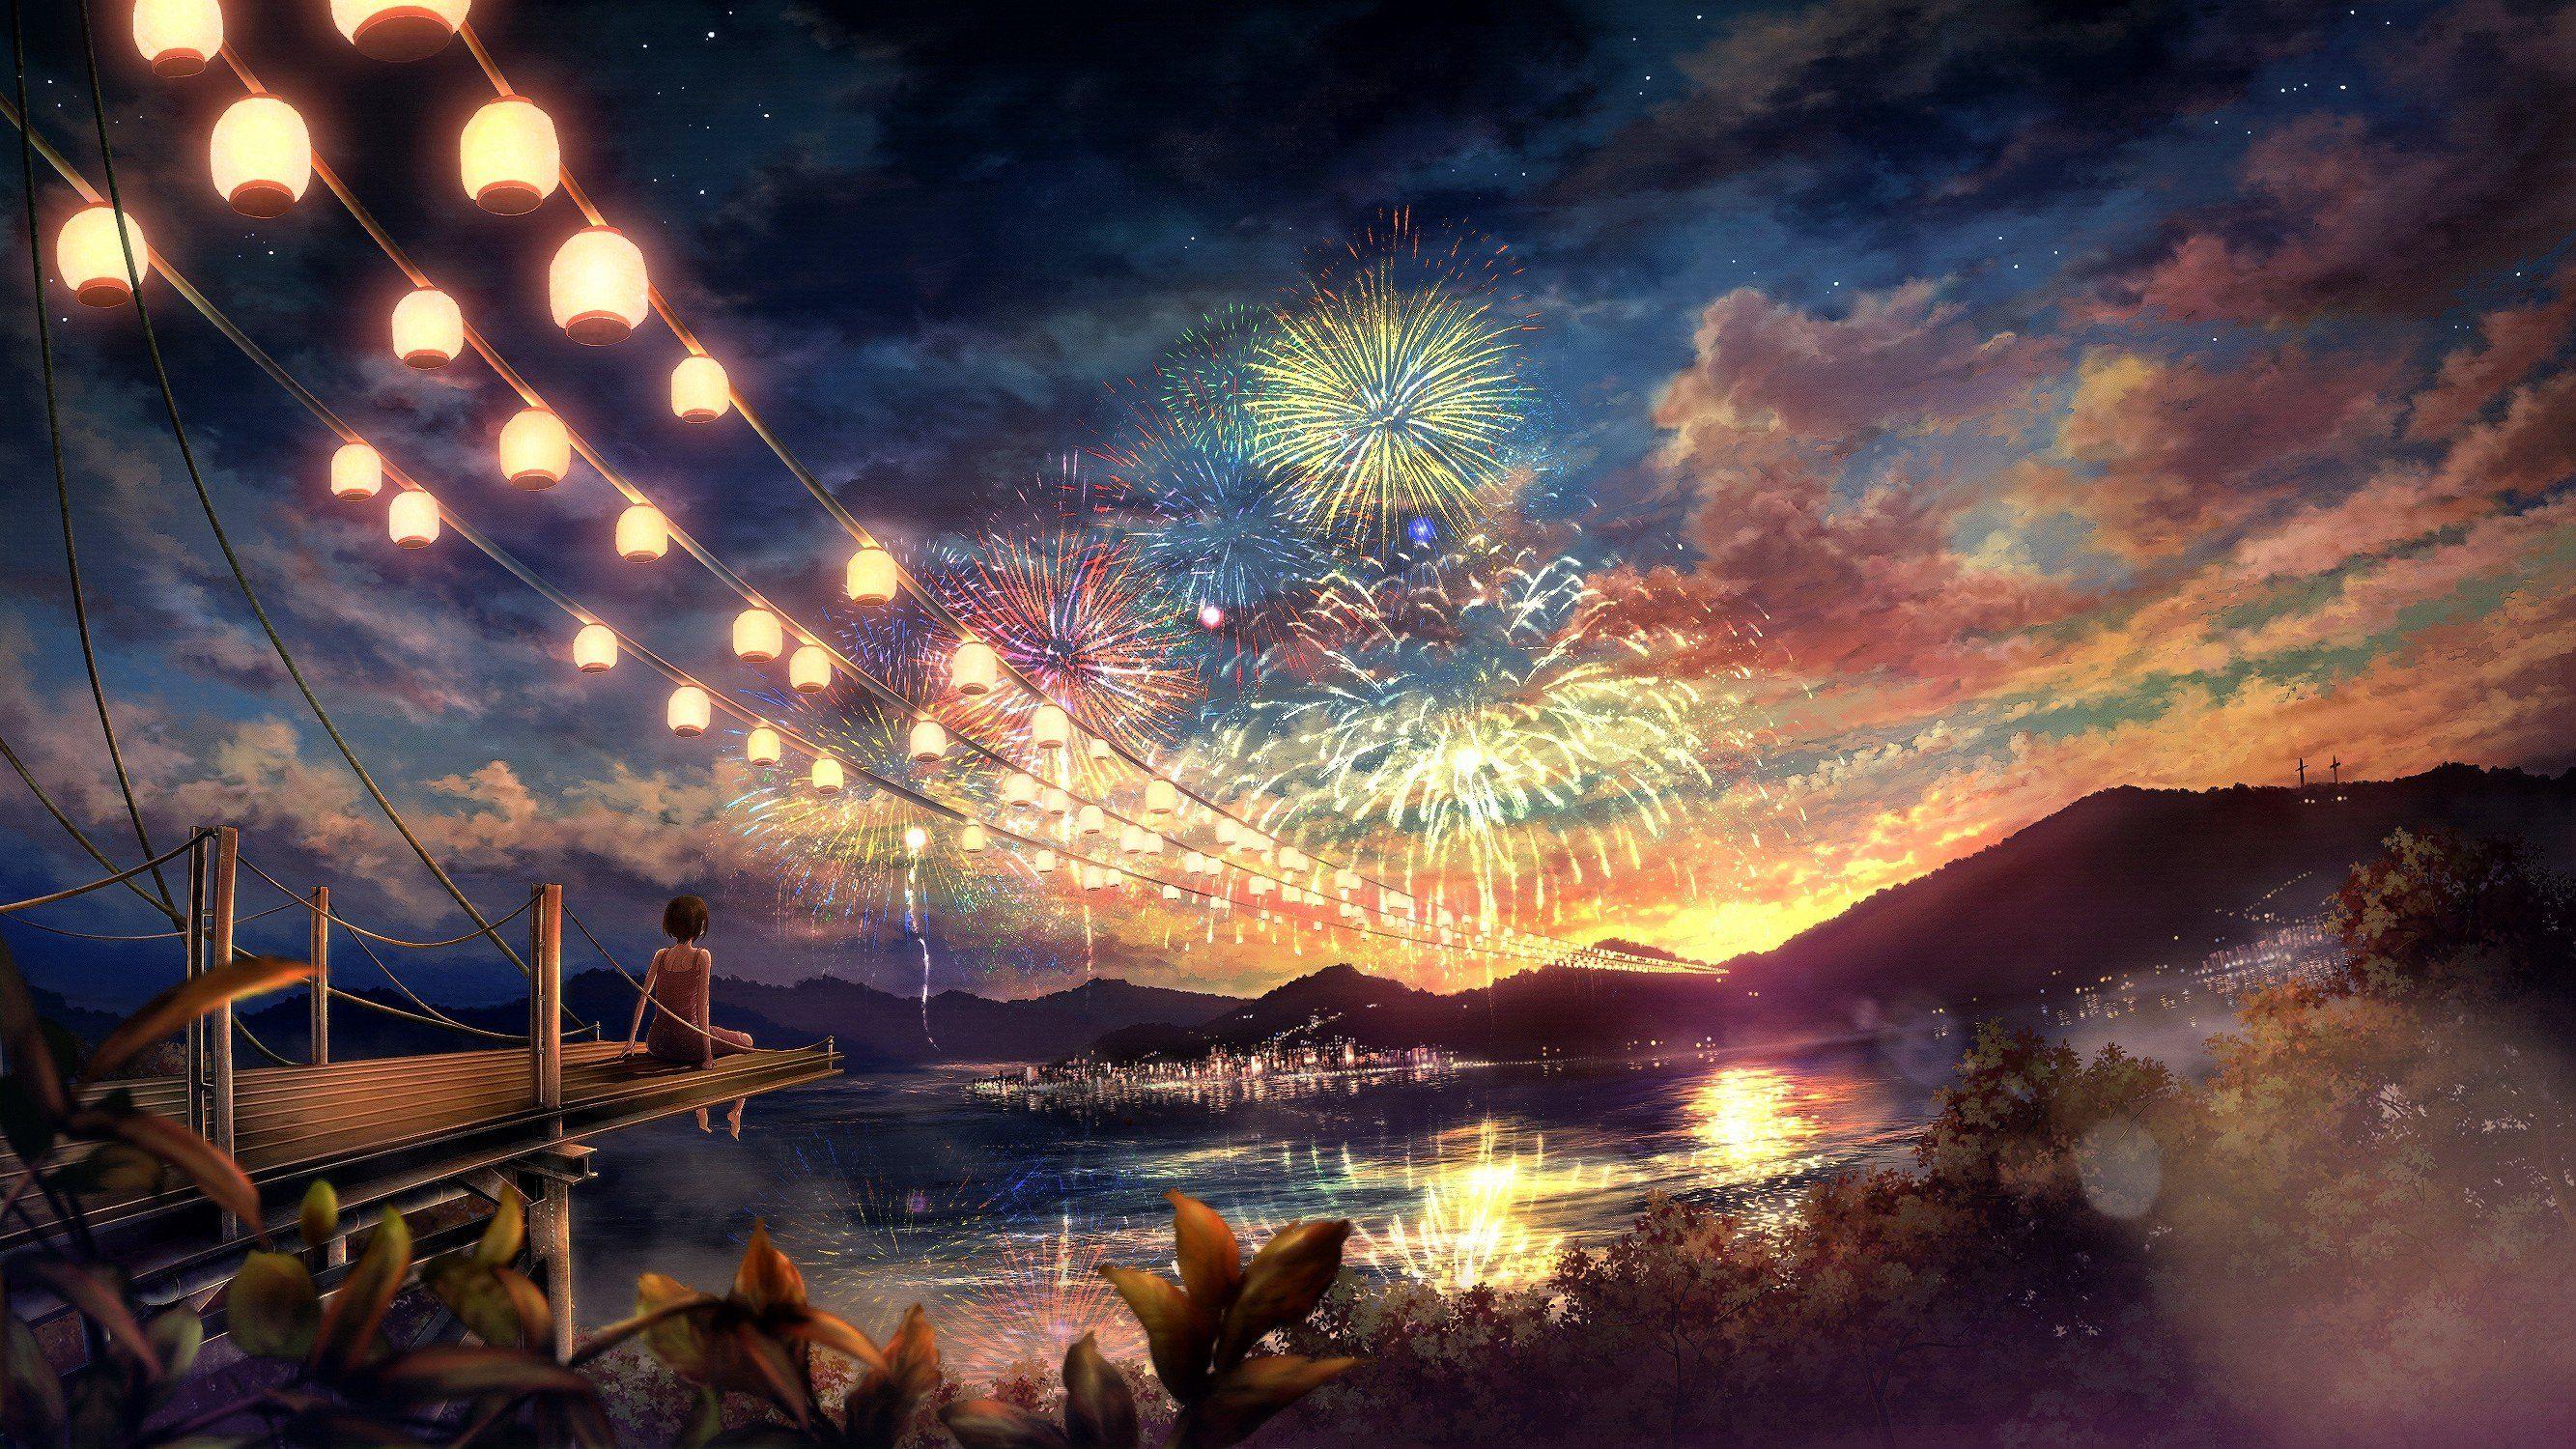 Anime Dark Landscape Wallpapers De Alta Resolucion Monodomo In 2020 Scenery Wallpaper Anime Scenery Landscape Wallpaper